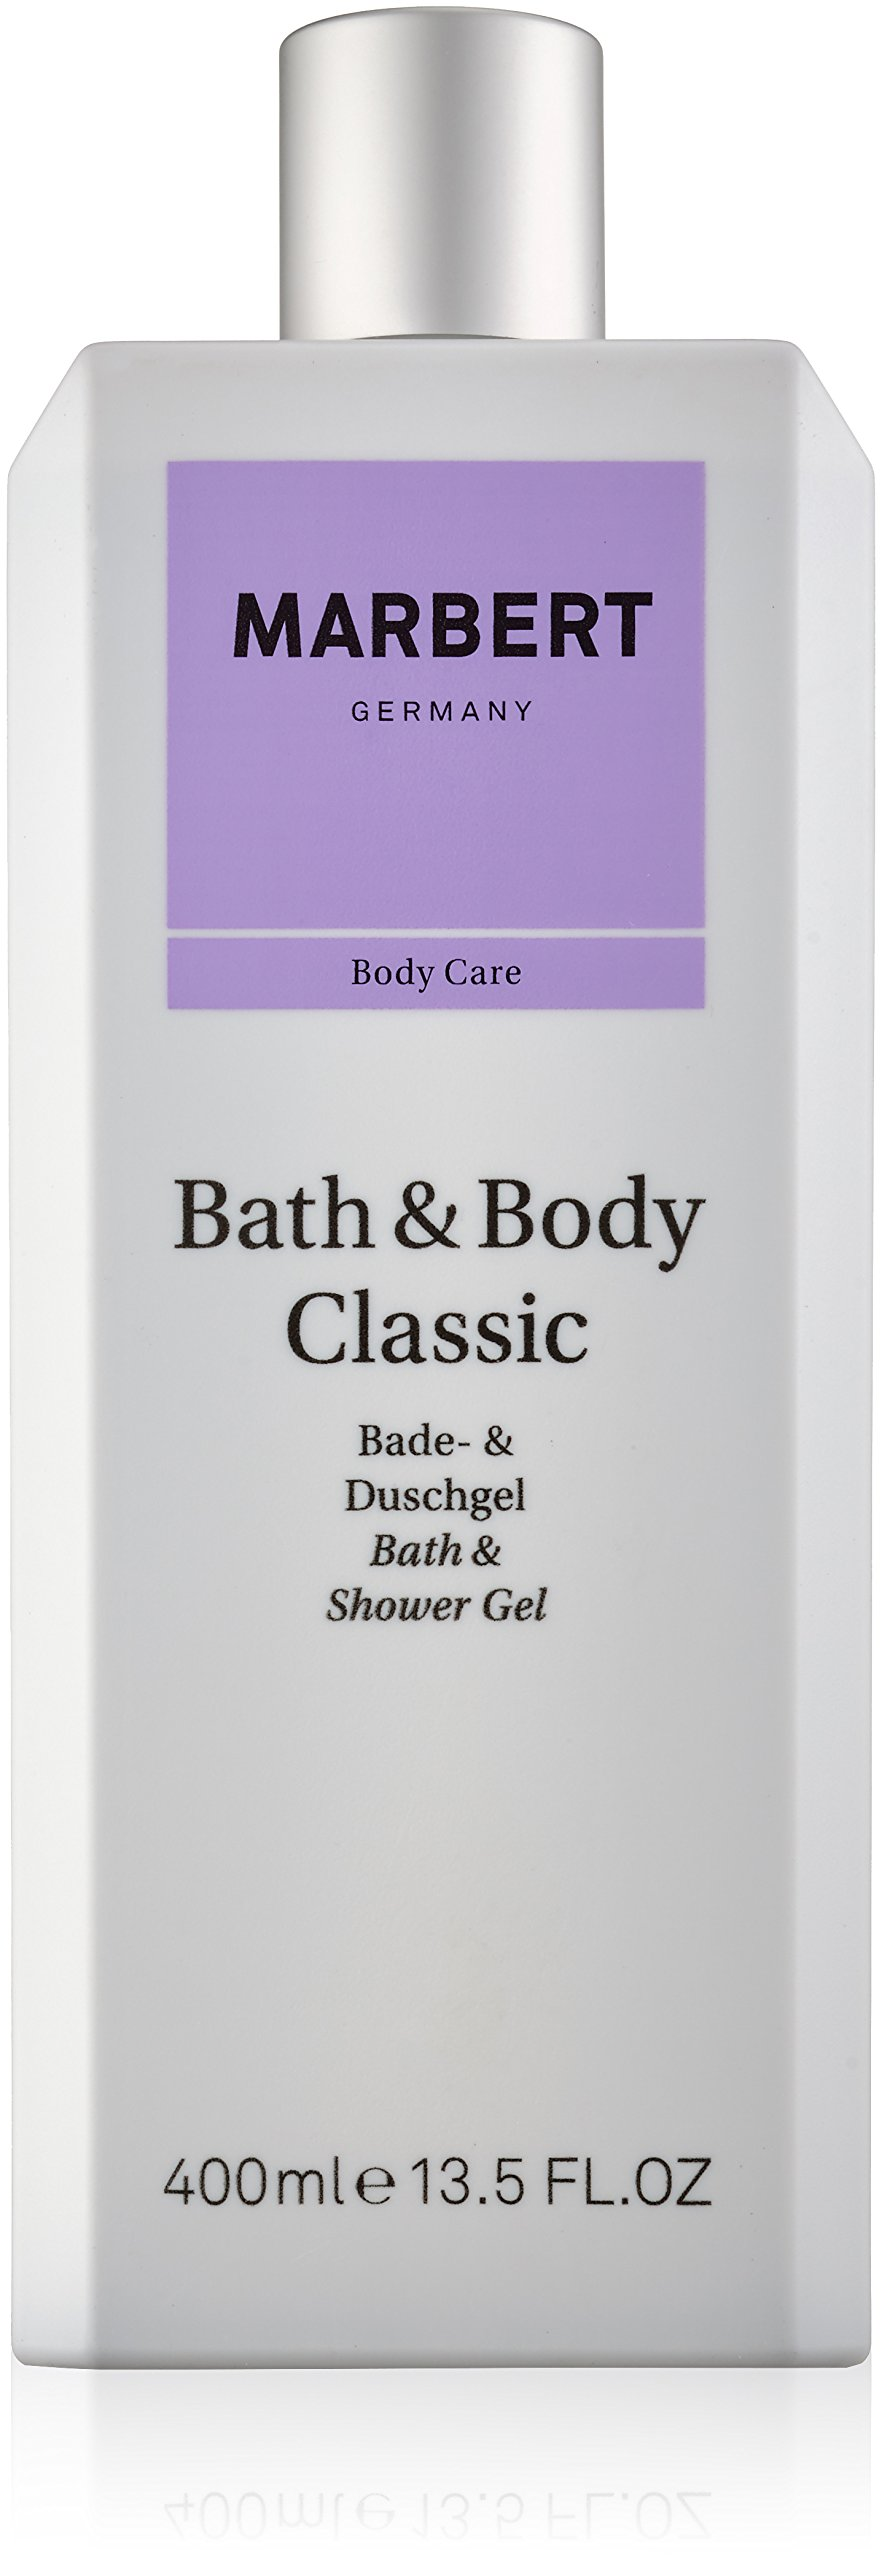 Marbert Bath and Body Classic Bath and Shower Gel 400 ml